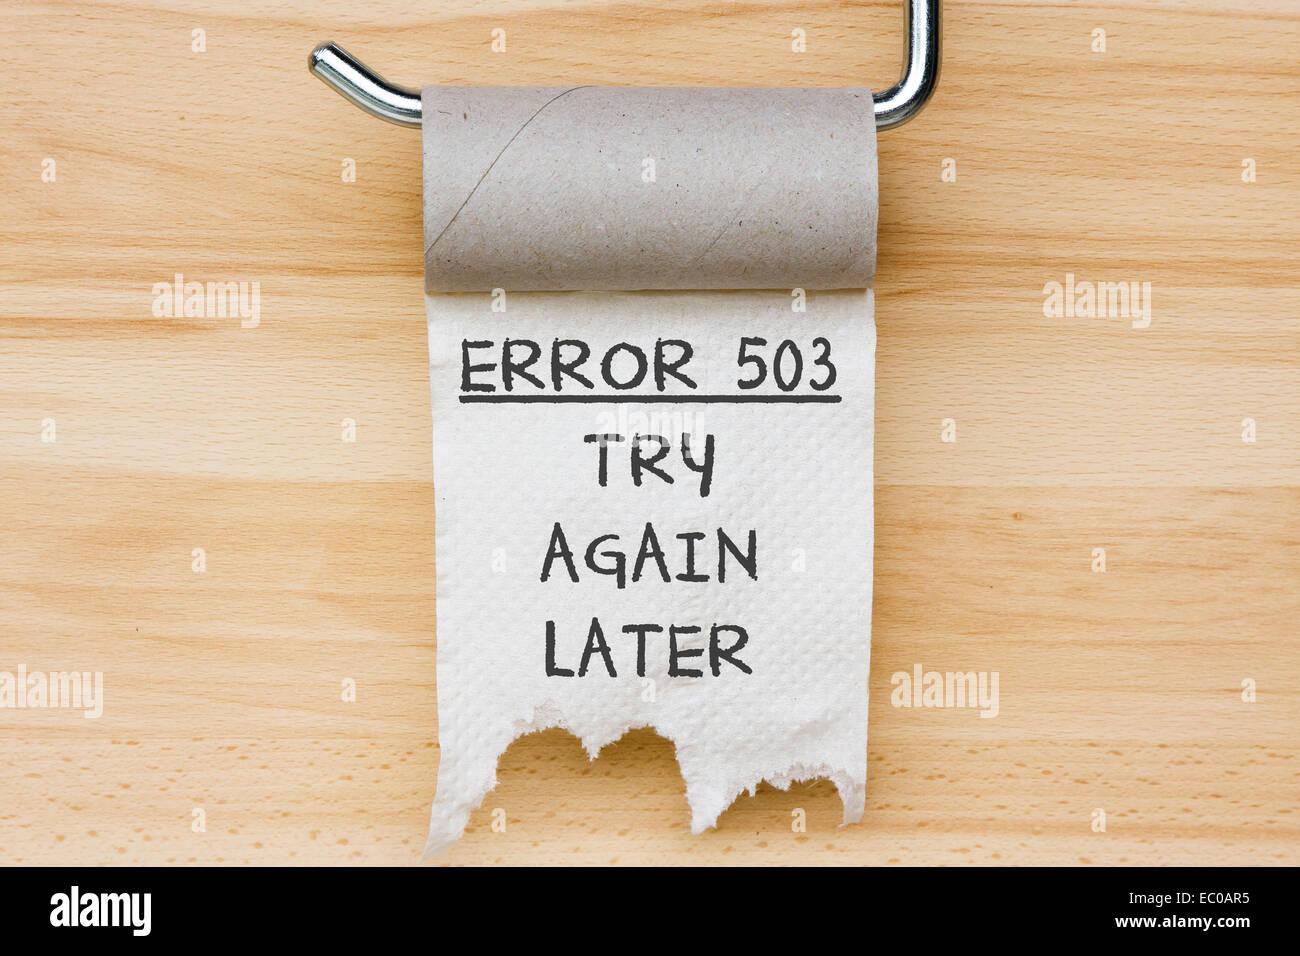 Error 503 - papel higiénico como mensaje web Imagen De Stock